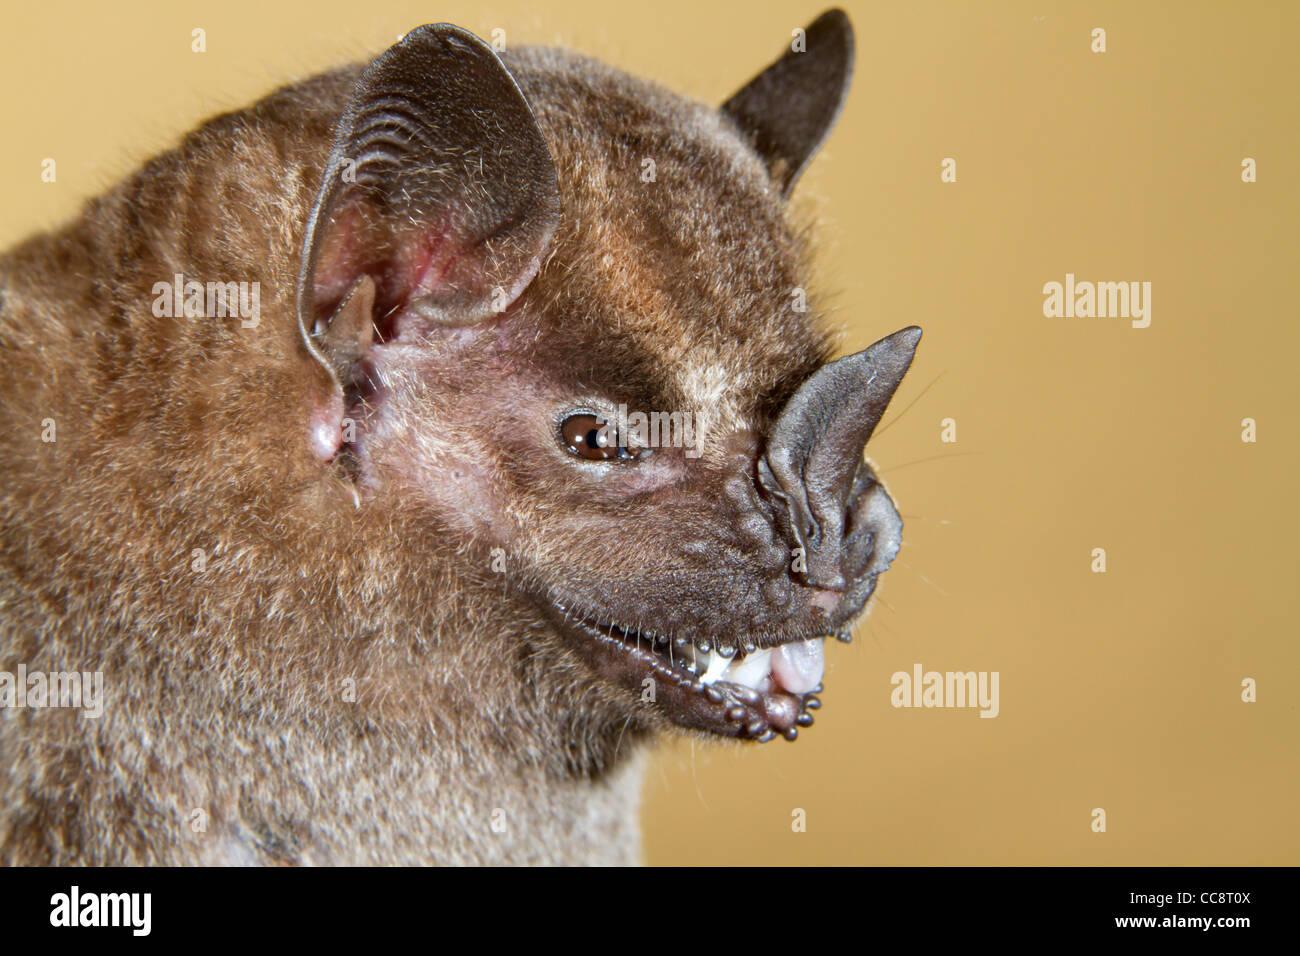 Jamaican, common or Mexican fruit bat (Artibeus jamaicensis). Stock Photo